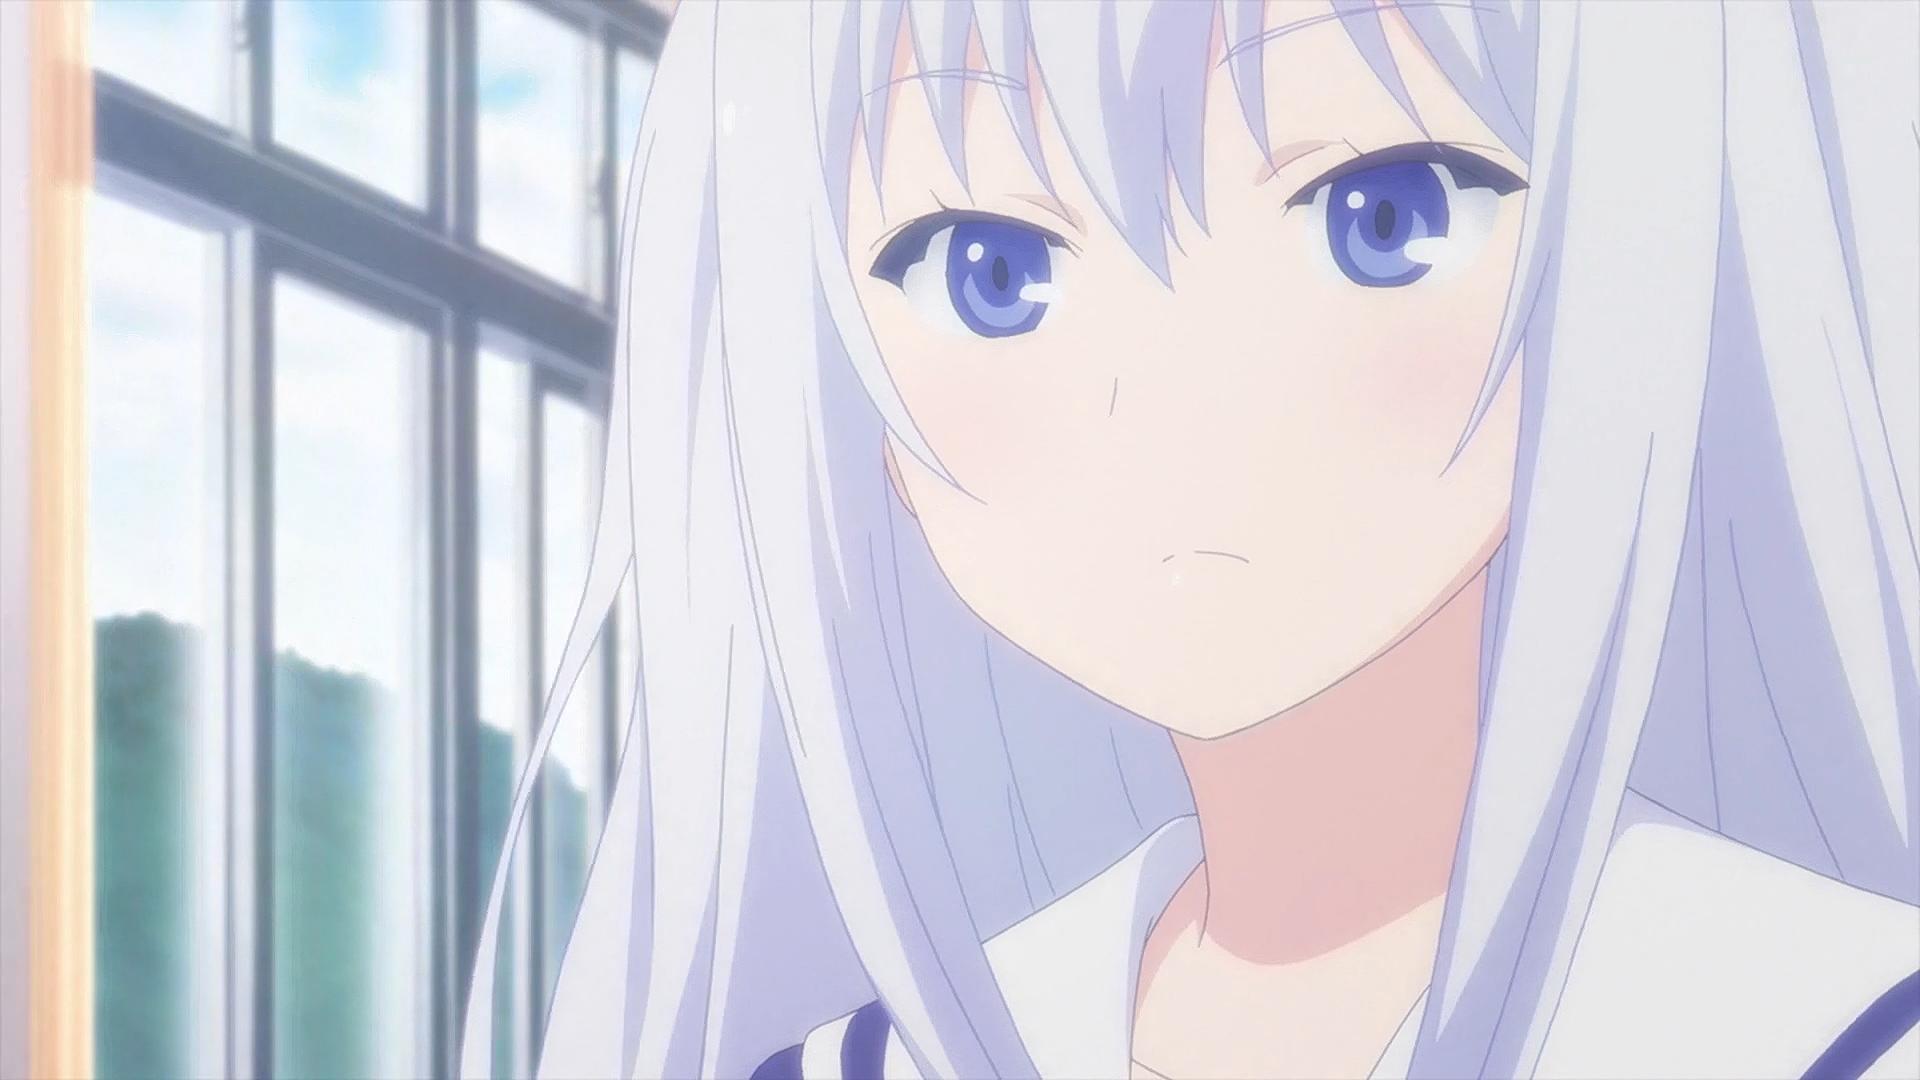 Natsukawa. Not sure if she likes Kidou or not... Anime: Ore no Kanojo to Osananajimi ga Shuraba Sugiru ( shortened to: OreShura) Not asking for thumbs, just wan